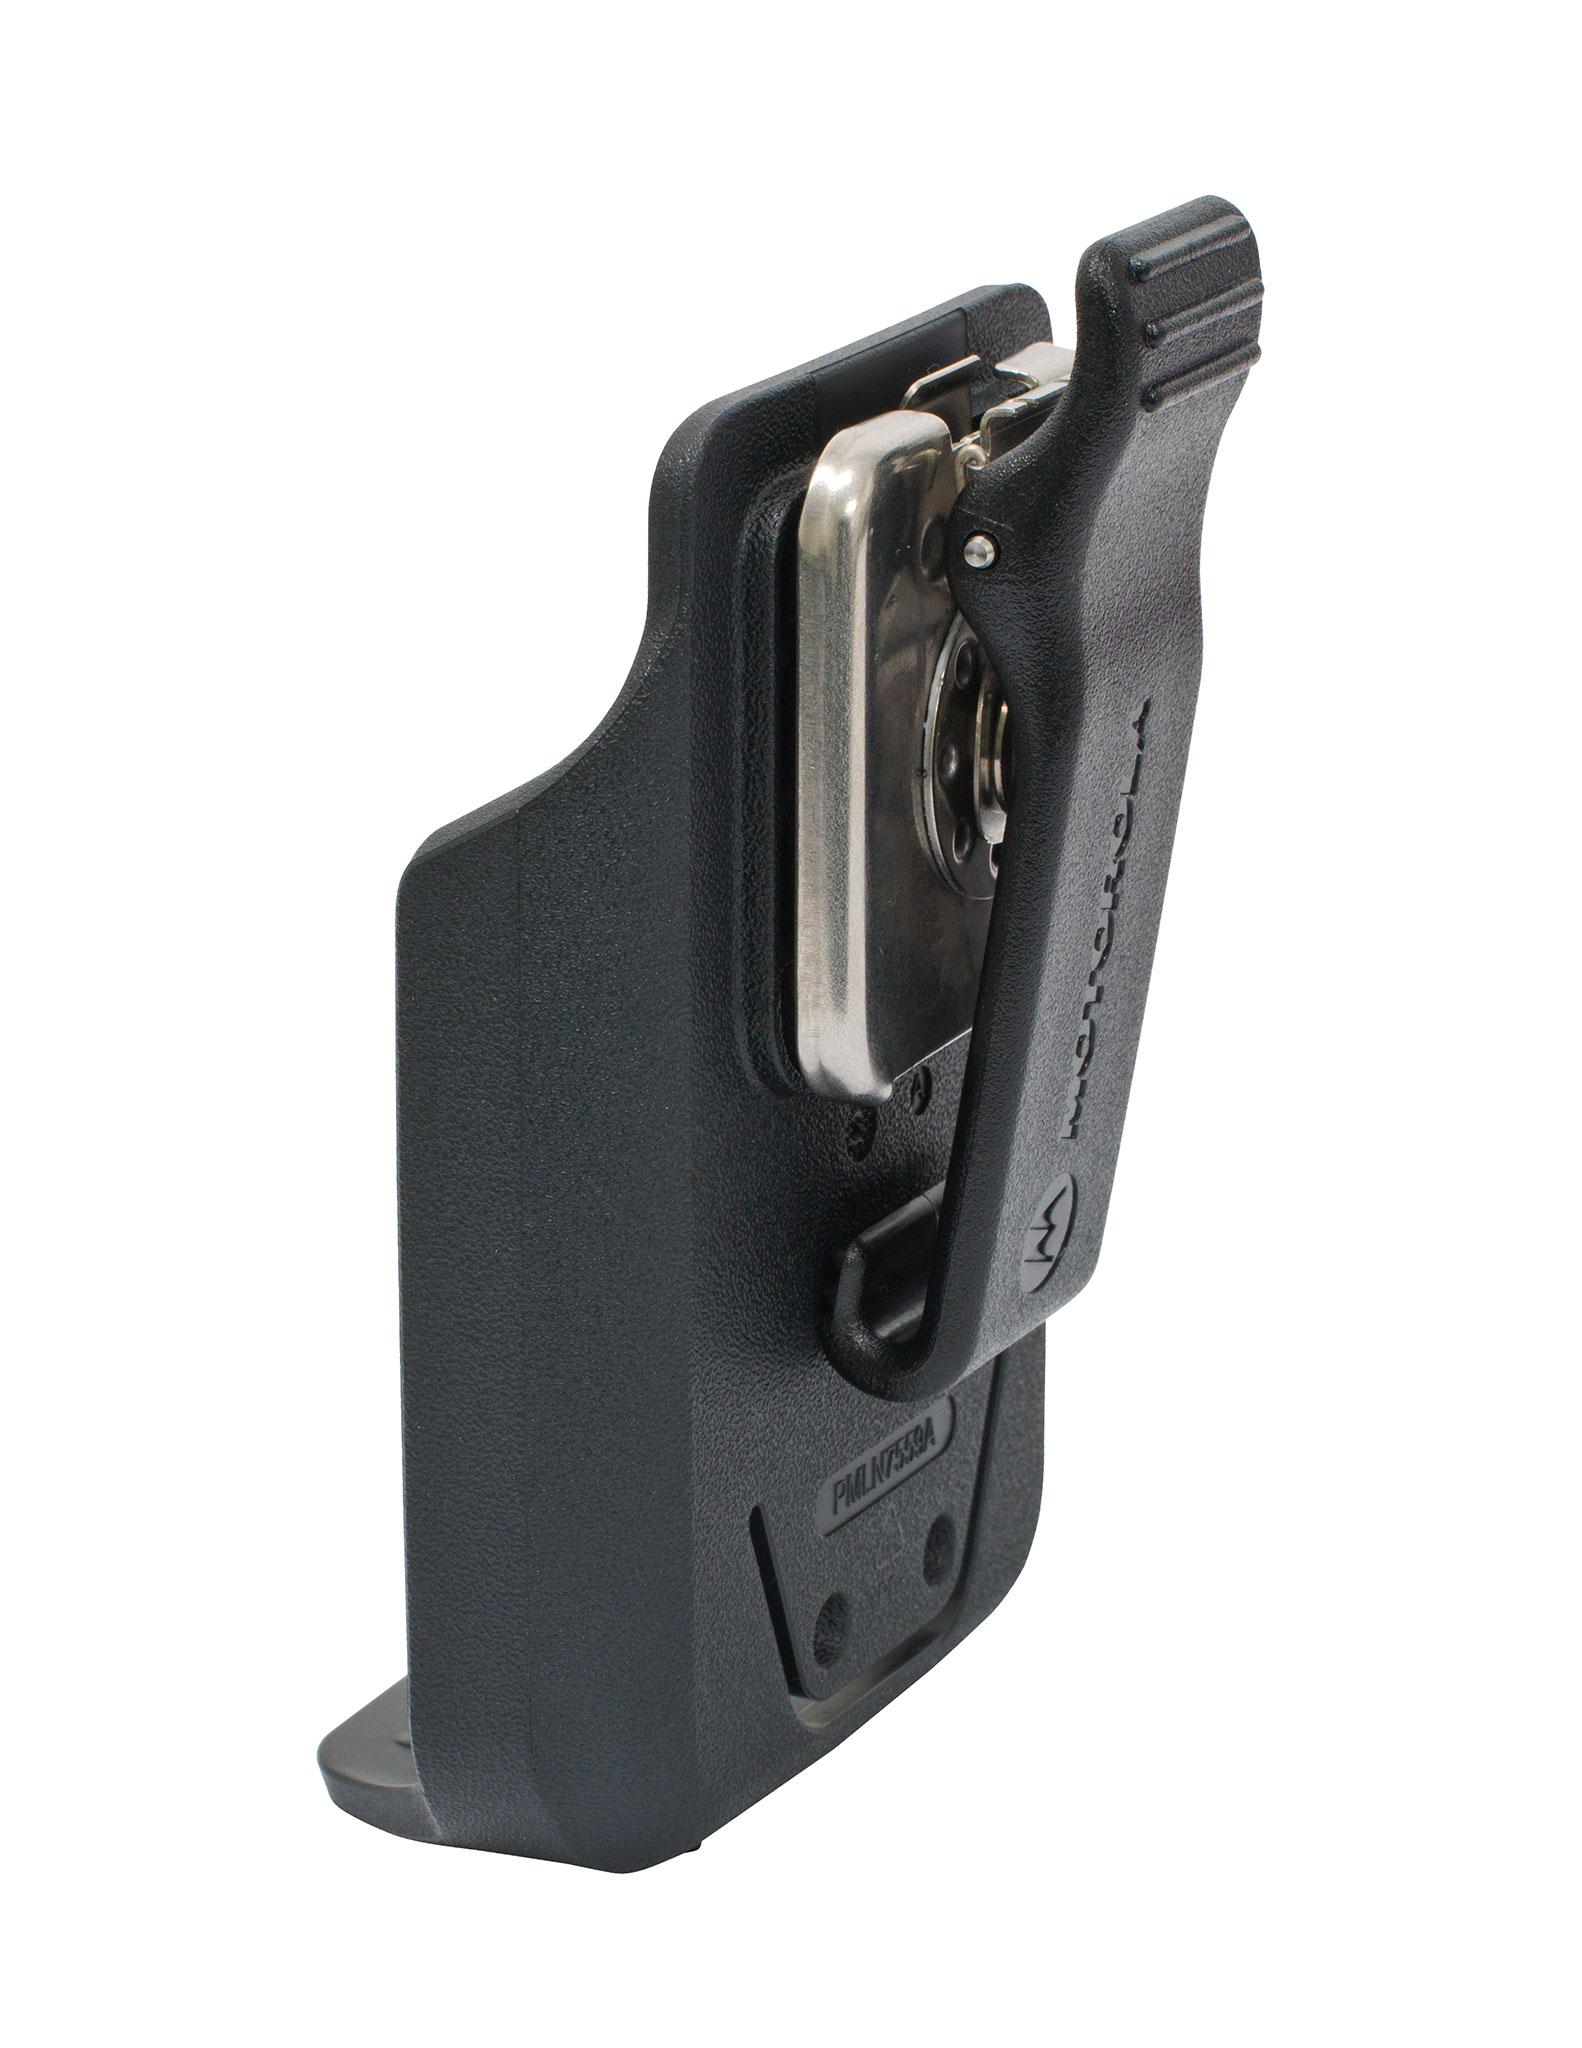 Motorola Carry Accessory – Holster, Plastic Carry Holder with Belt Clip suit DP3441e DP3661e